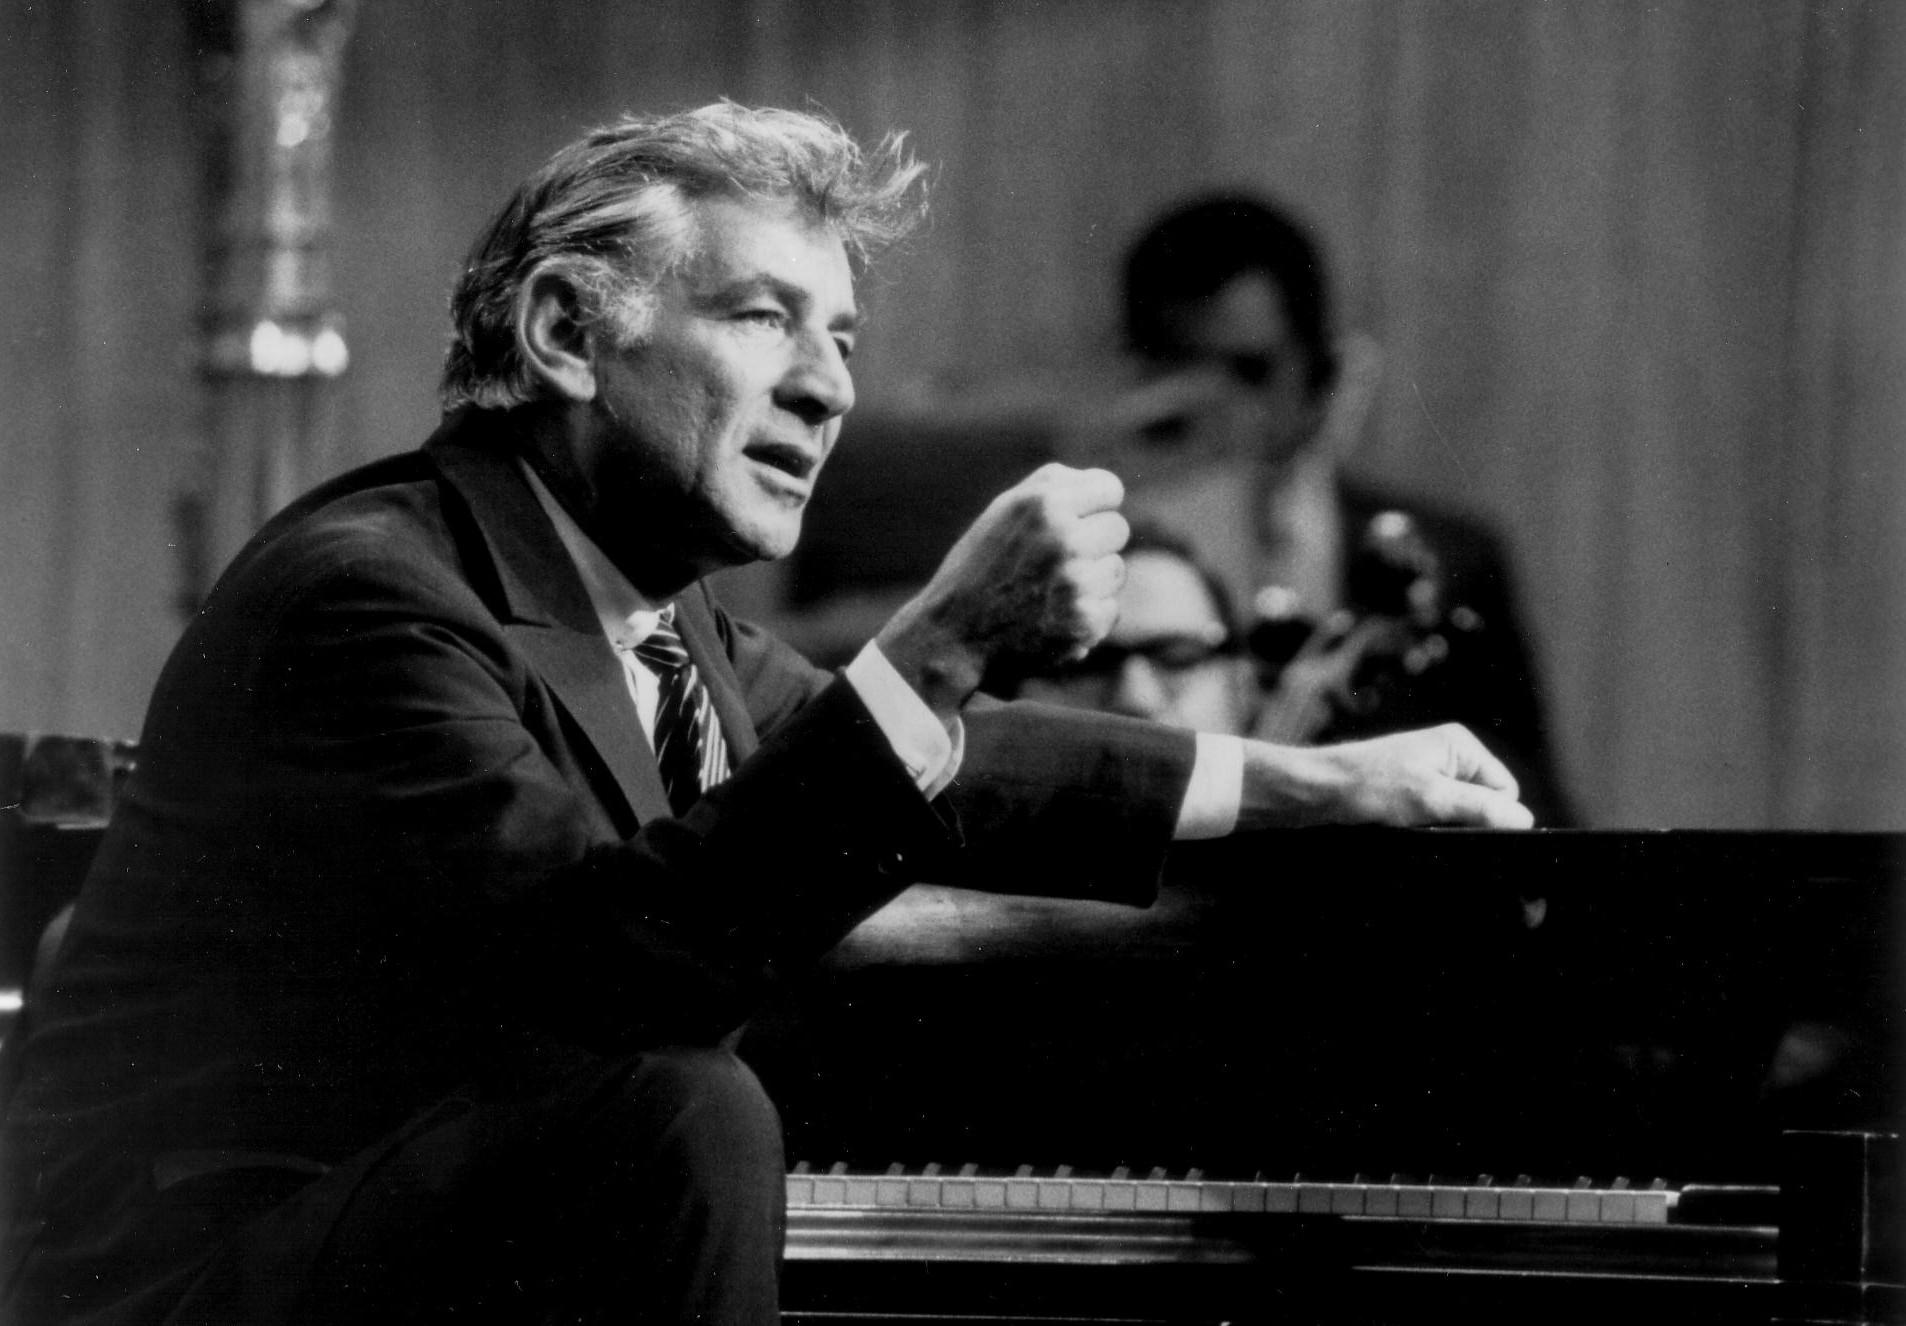 Performing Arts Platform Series Leonard Bernstein: His World Through Music, Saturday May 9 at UCCA